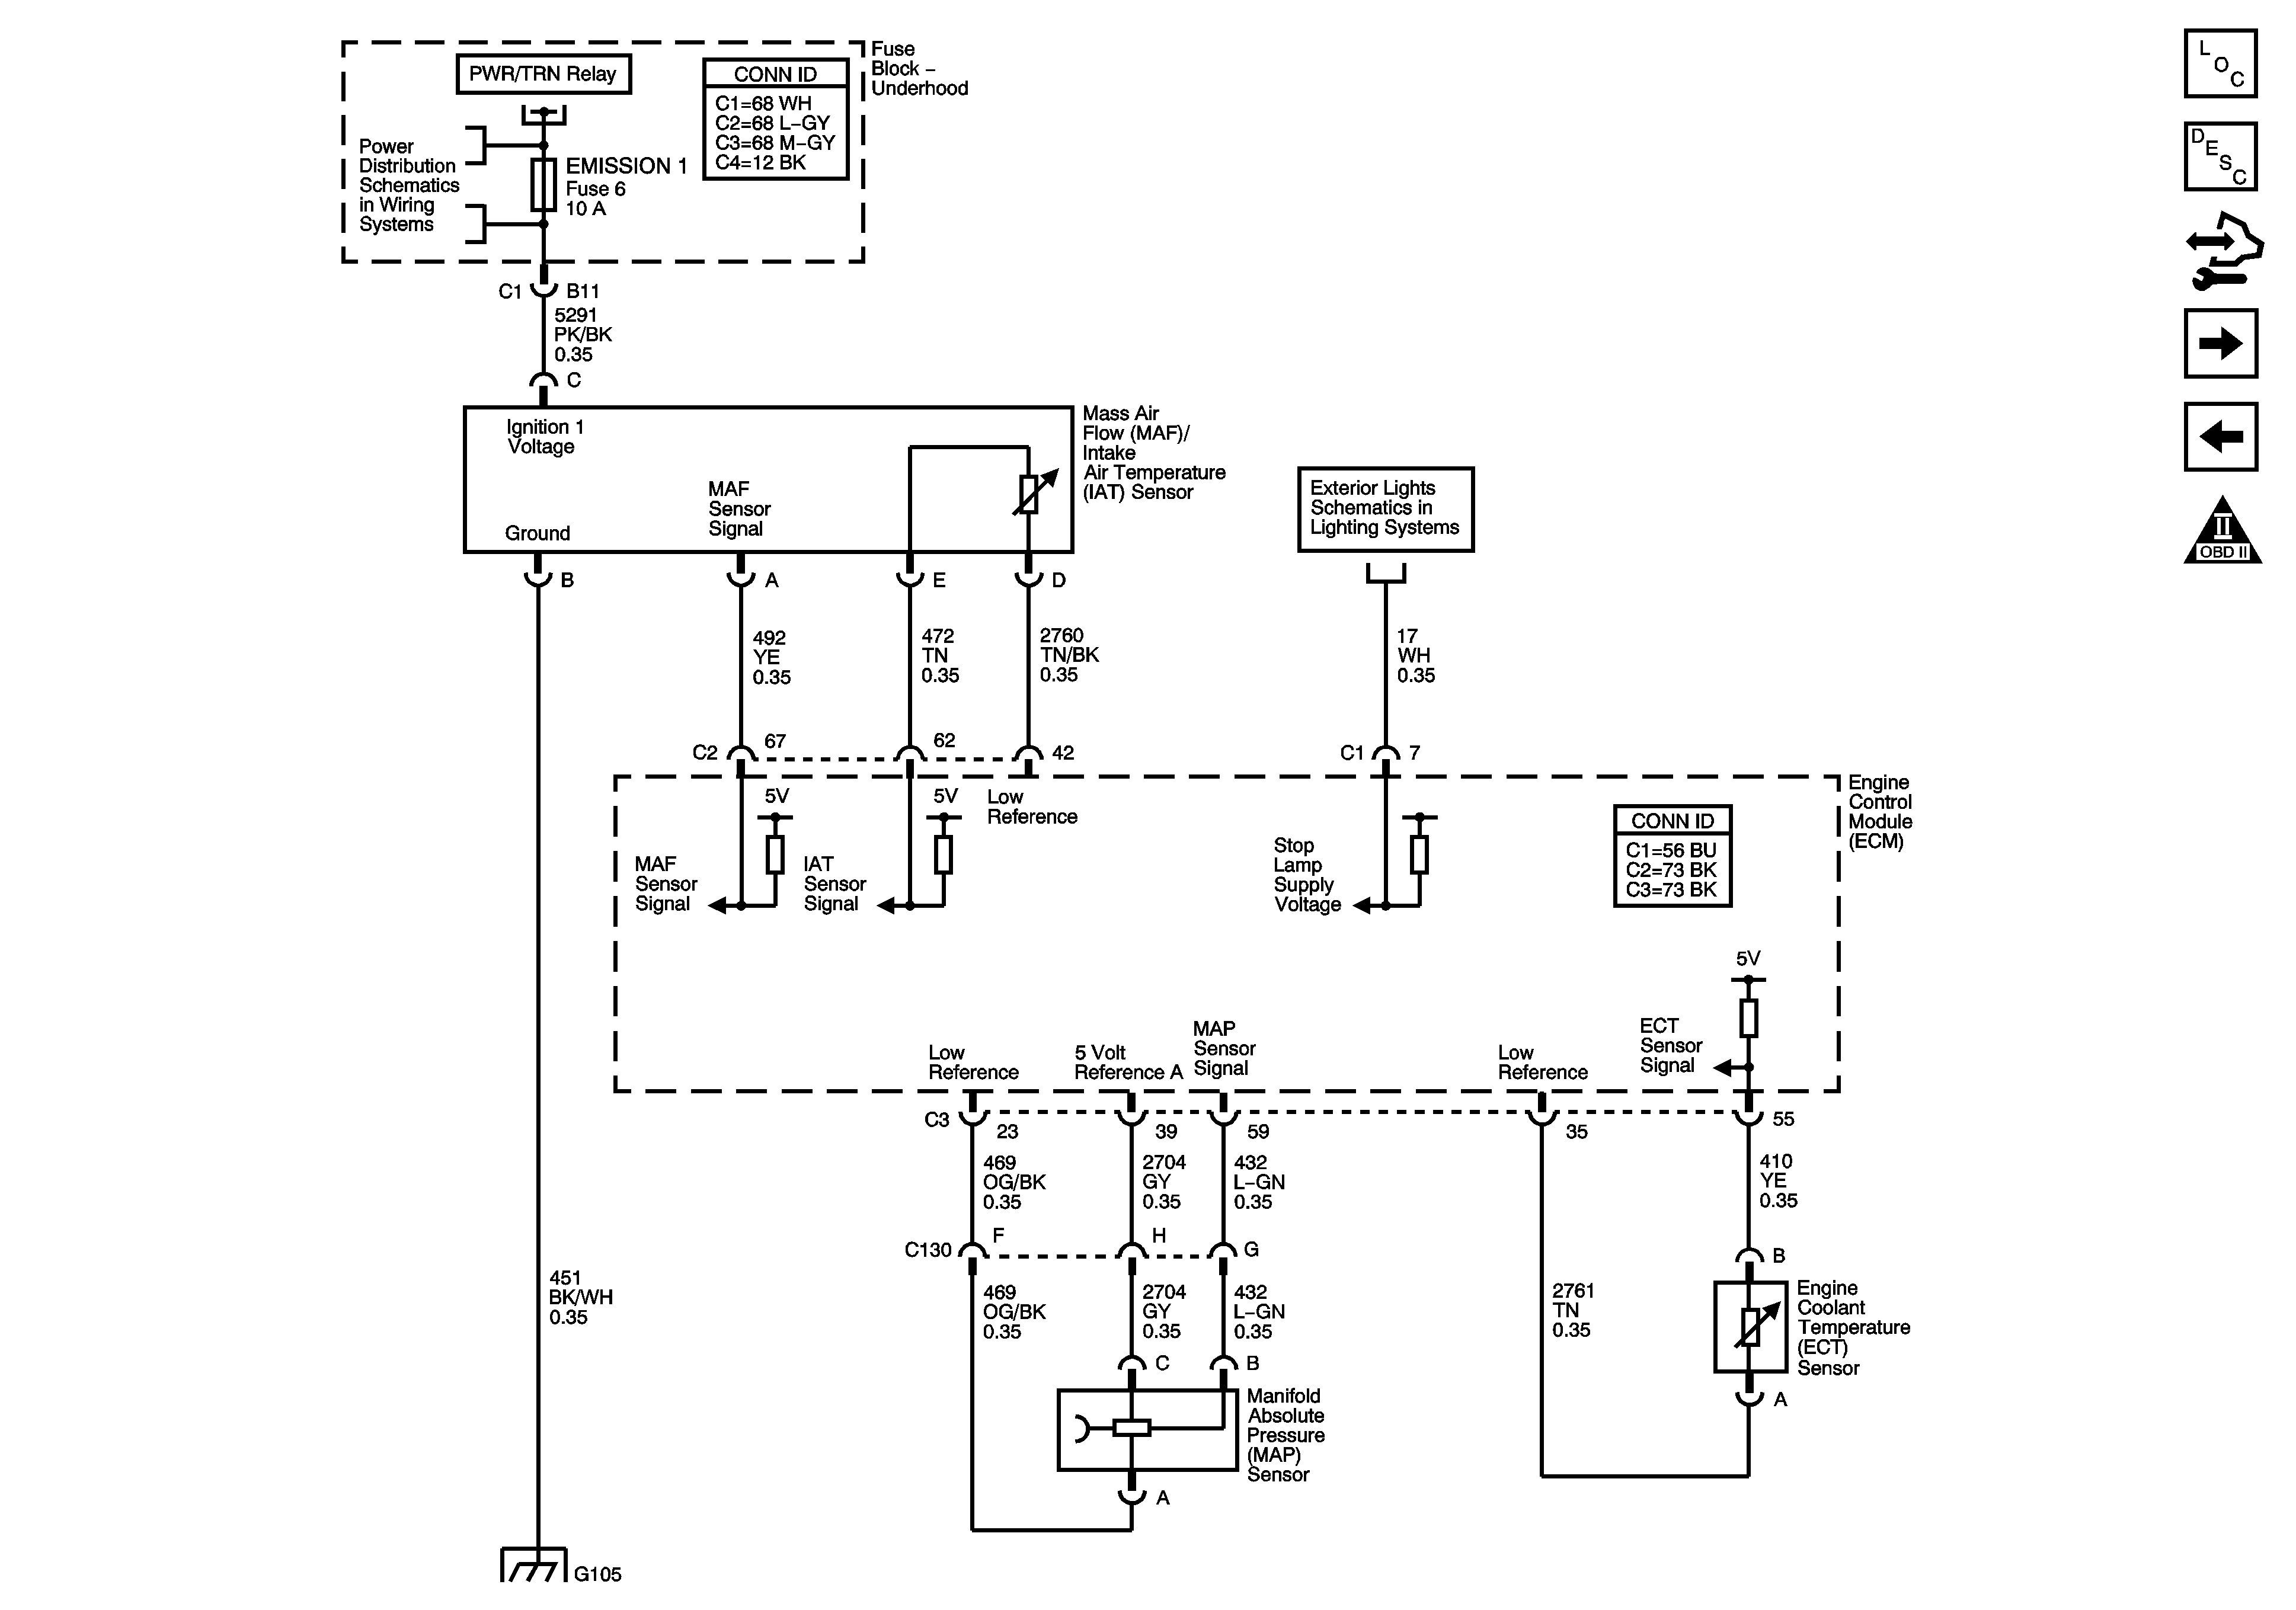 wiring diagrams - Pontiac G6 Forum